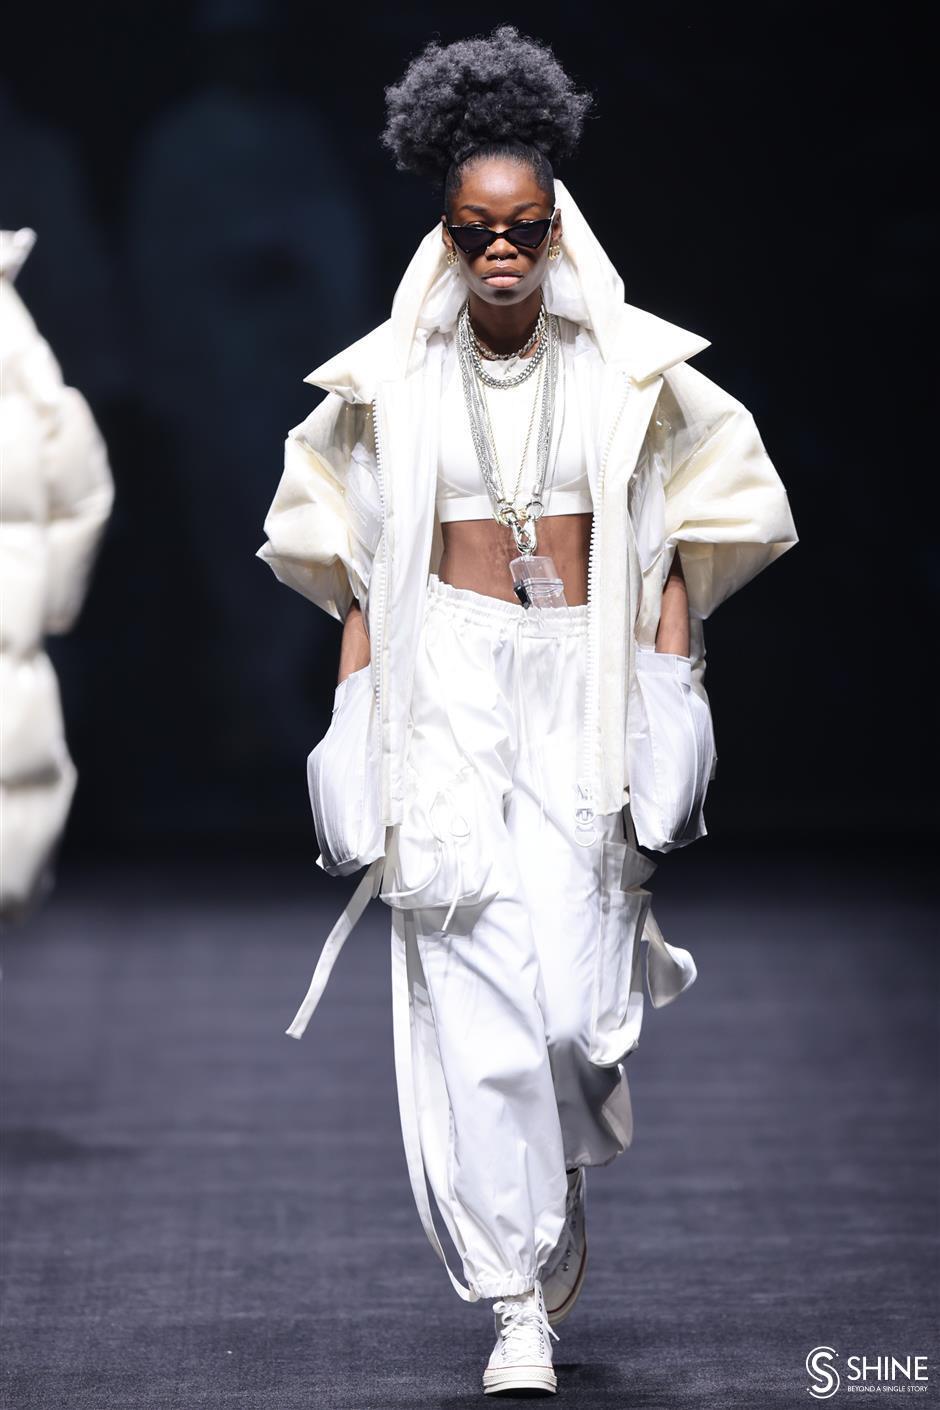 Shanghai Fashion Week becomes industry pioneer